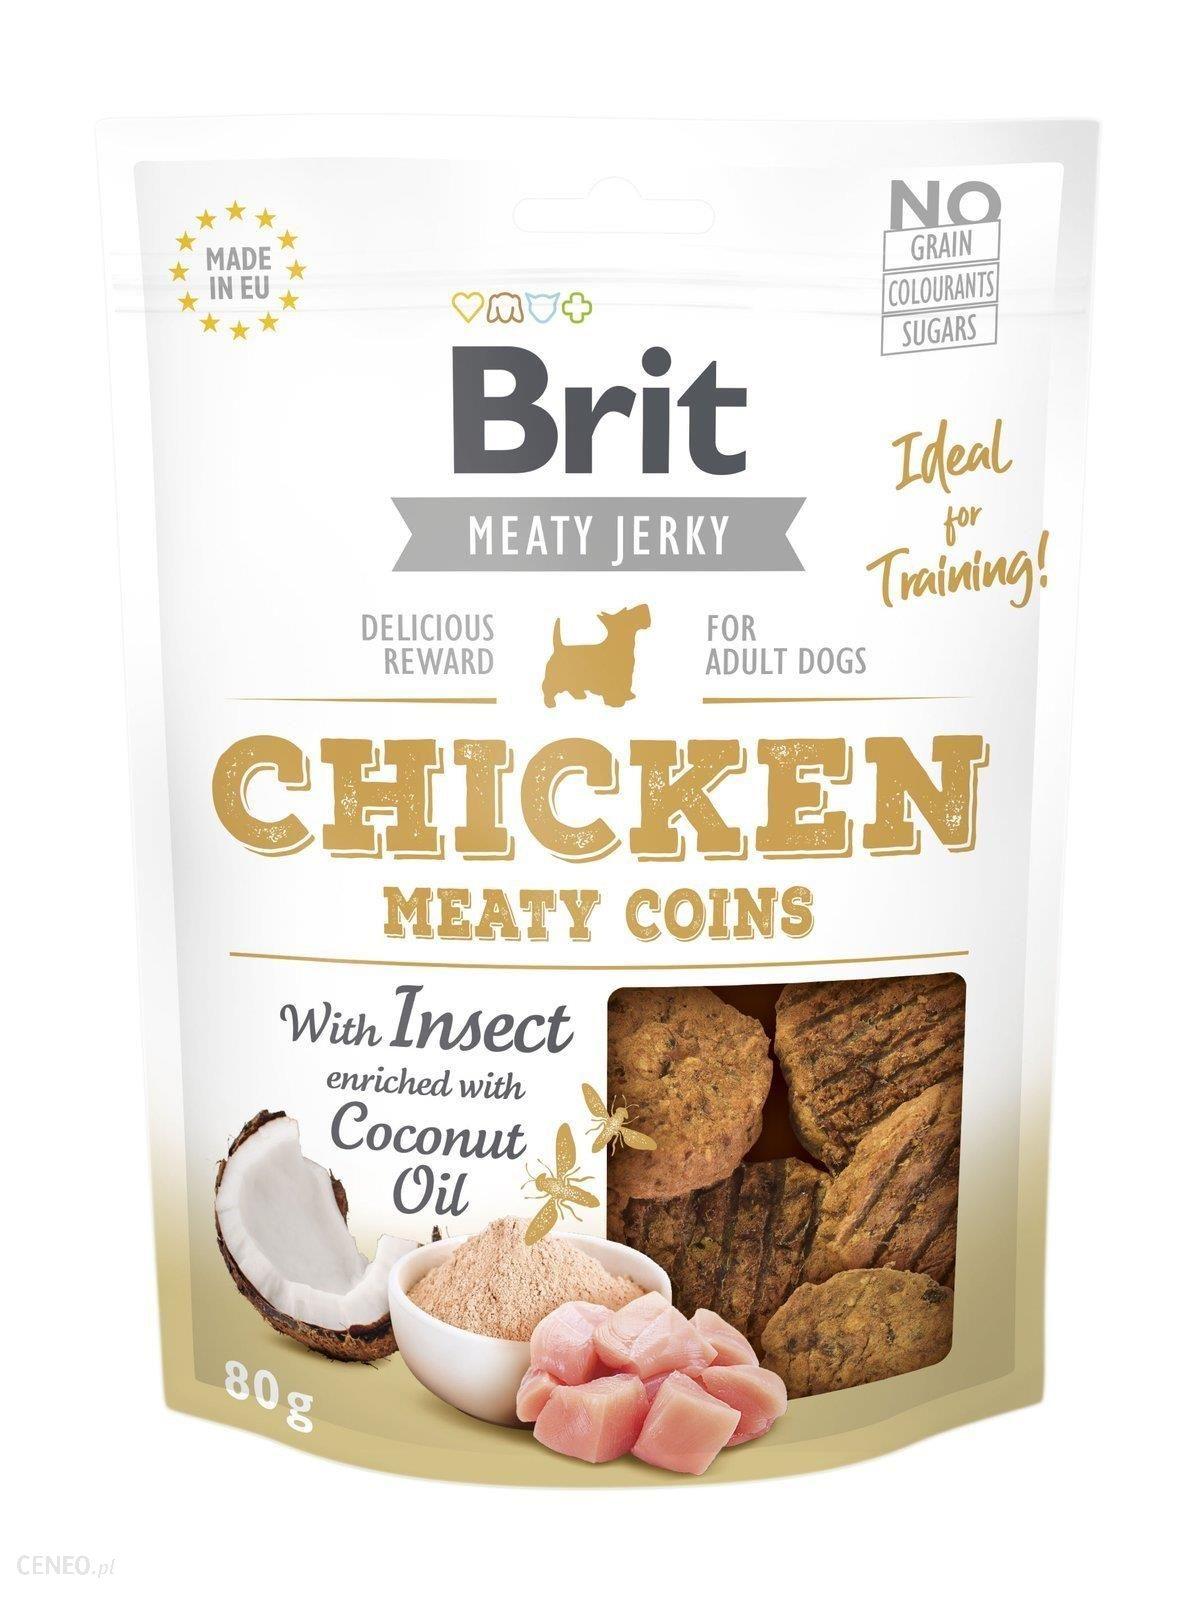 Brit Jerky Snack Chicken Meaty Coins with Insect Kurczak Z Owadami 200G